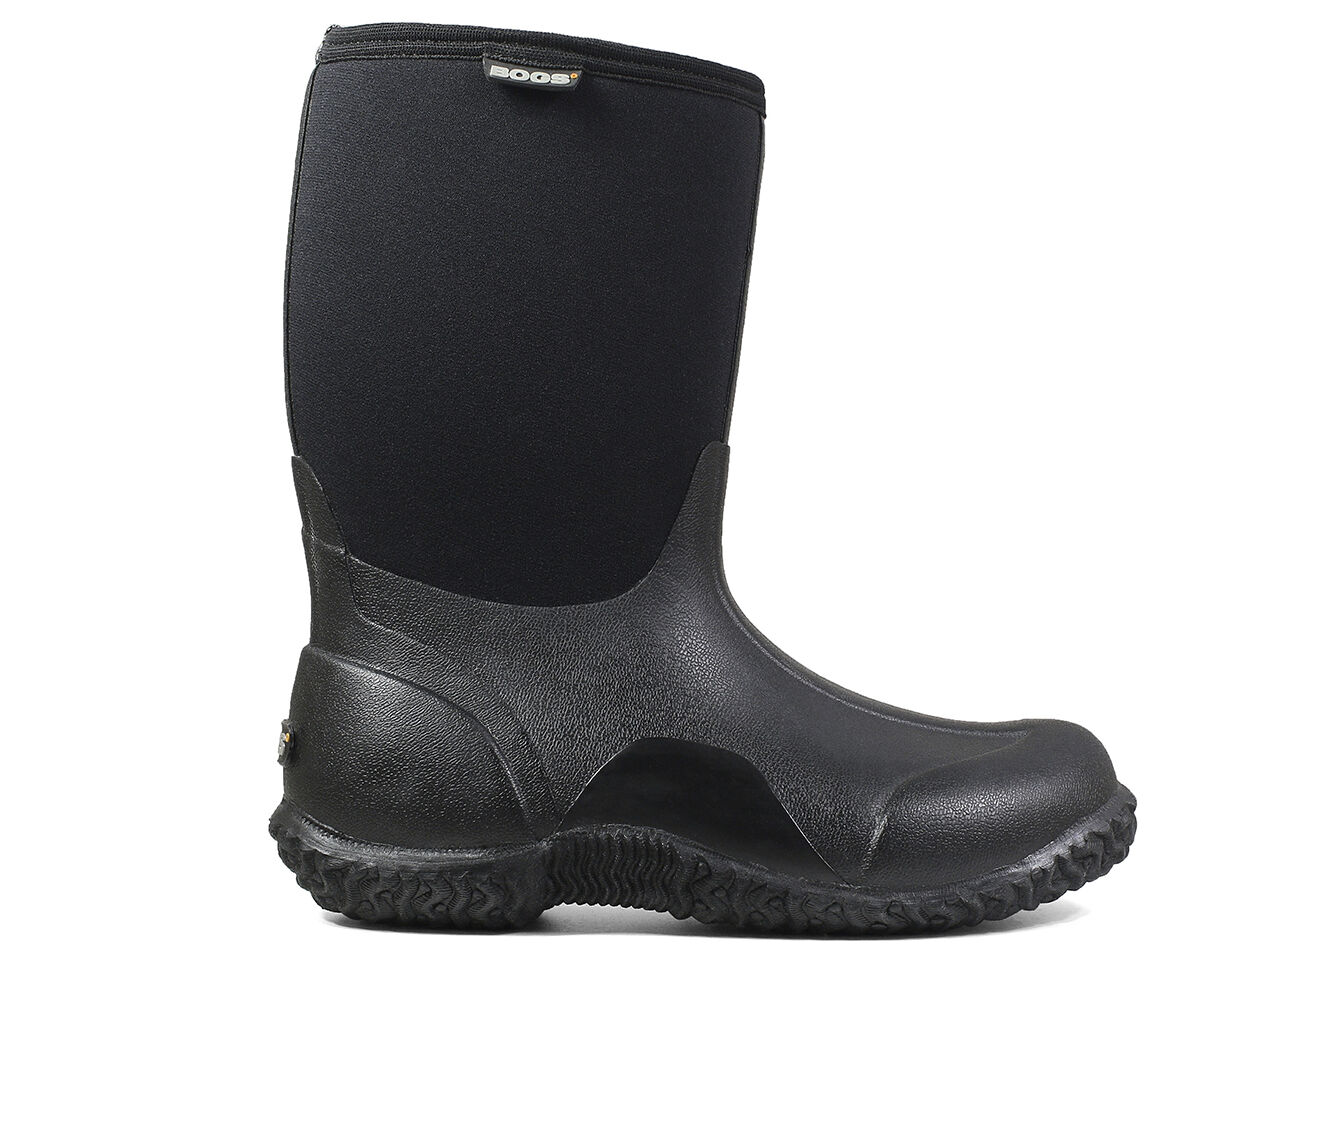 Women's Bogs Footwear Classic Mid No Handles Winter Boots Black